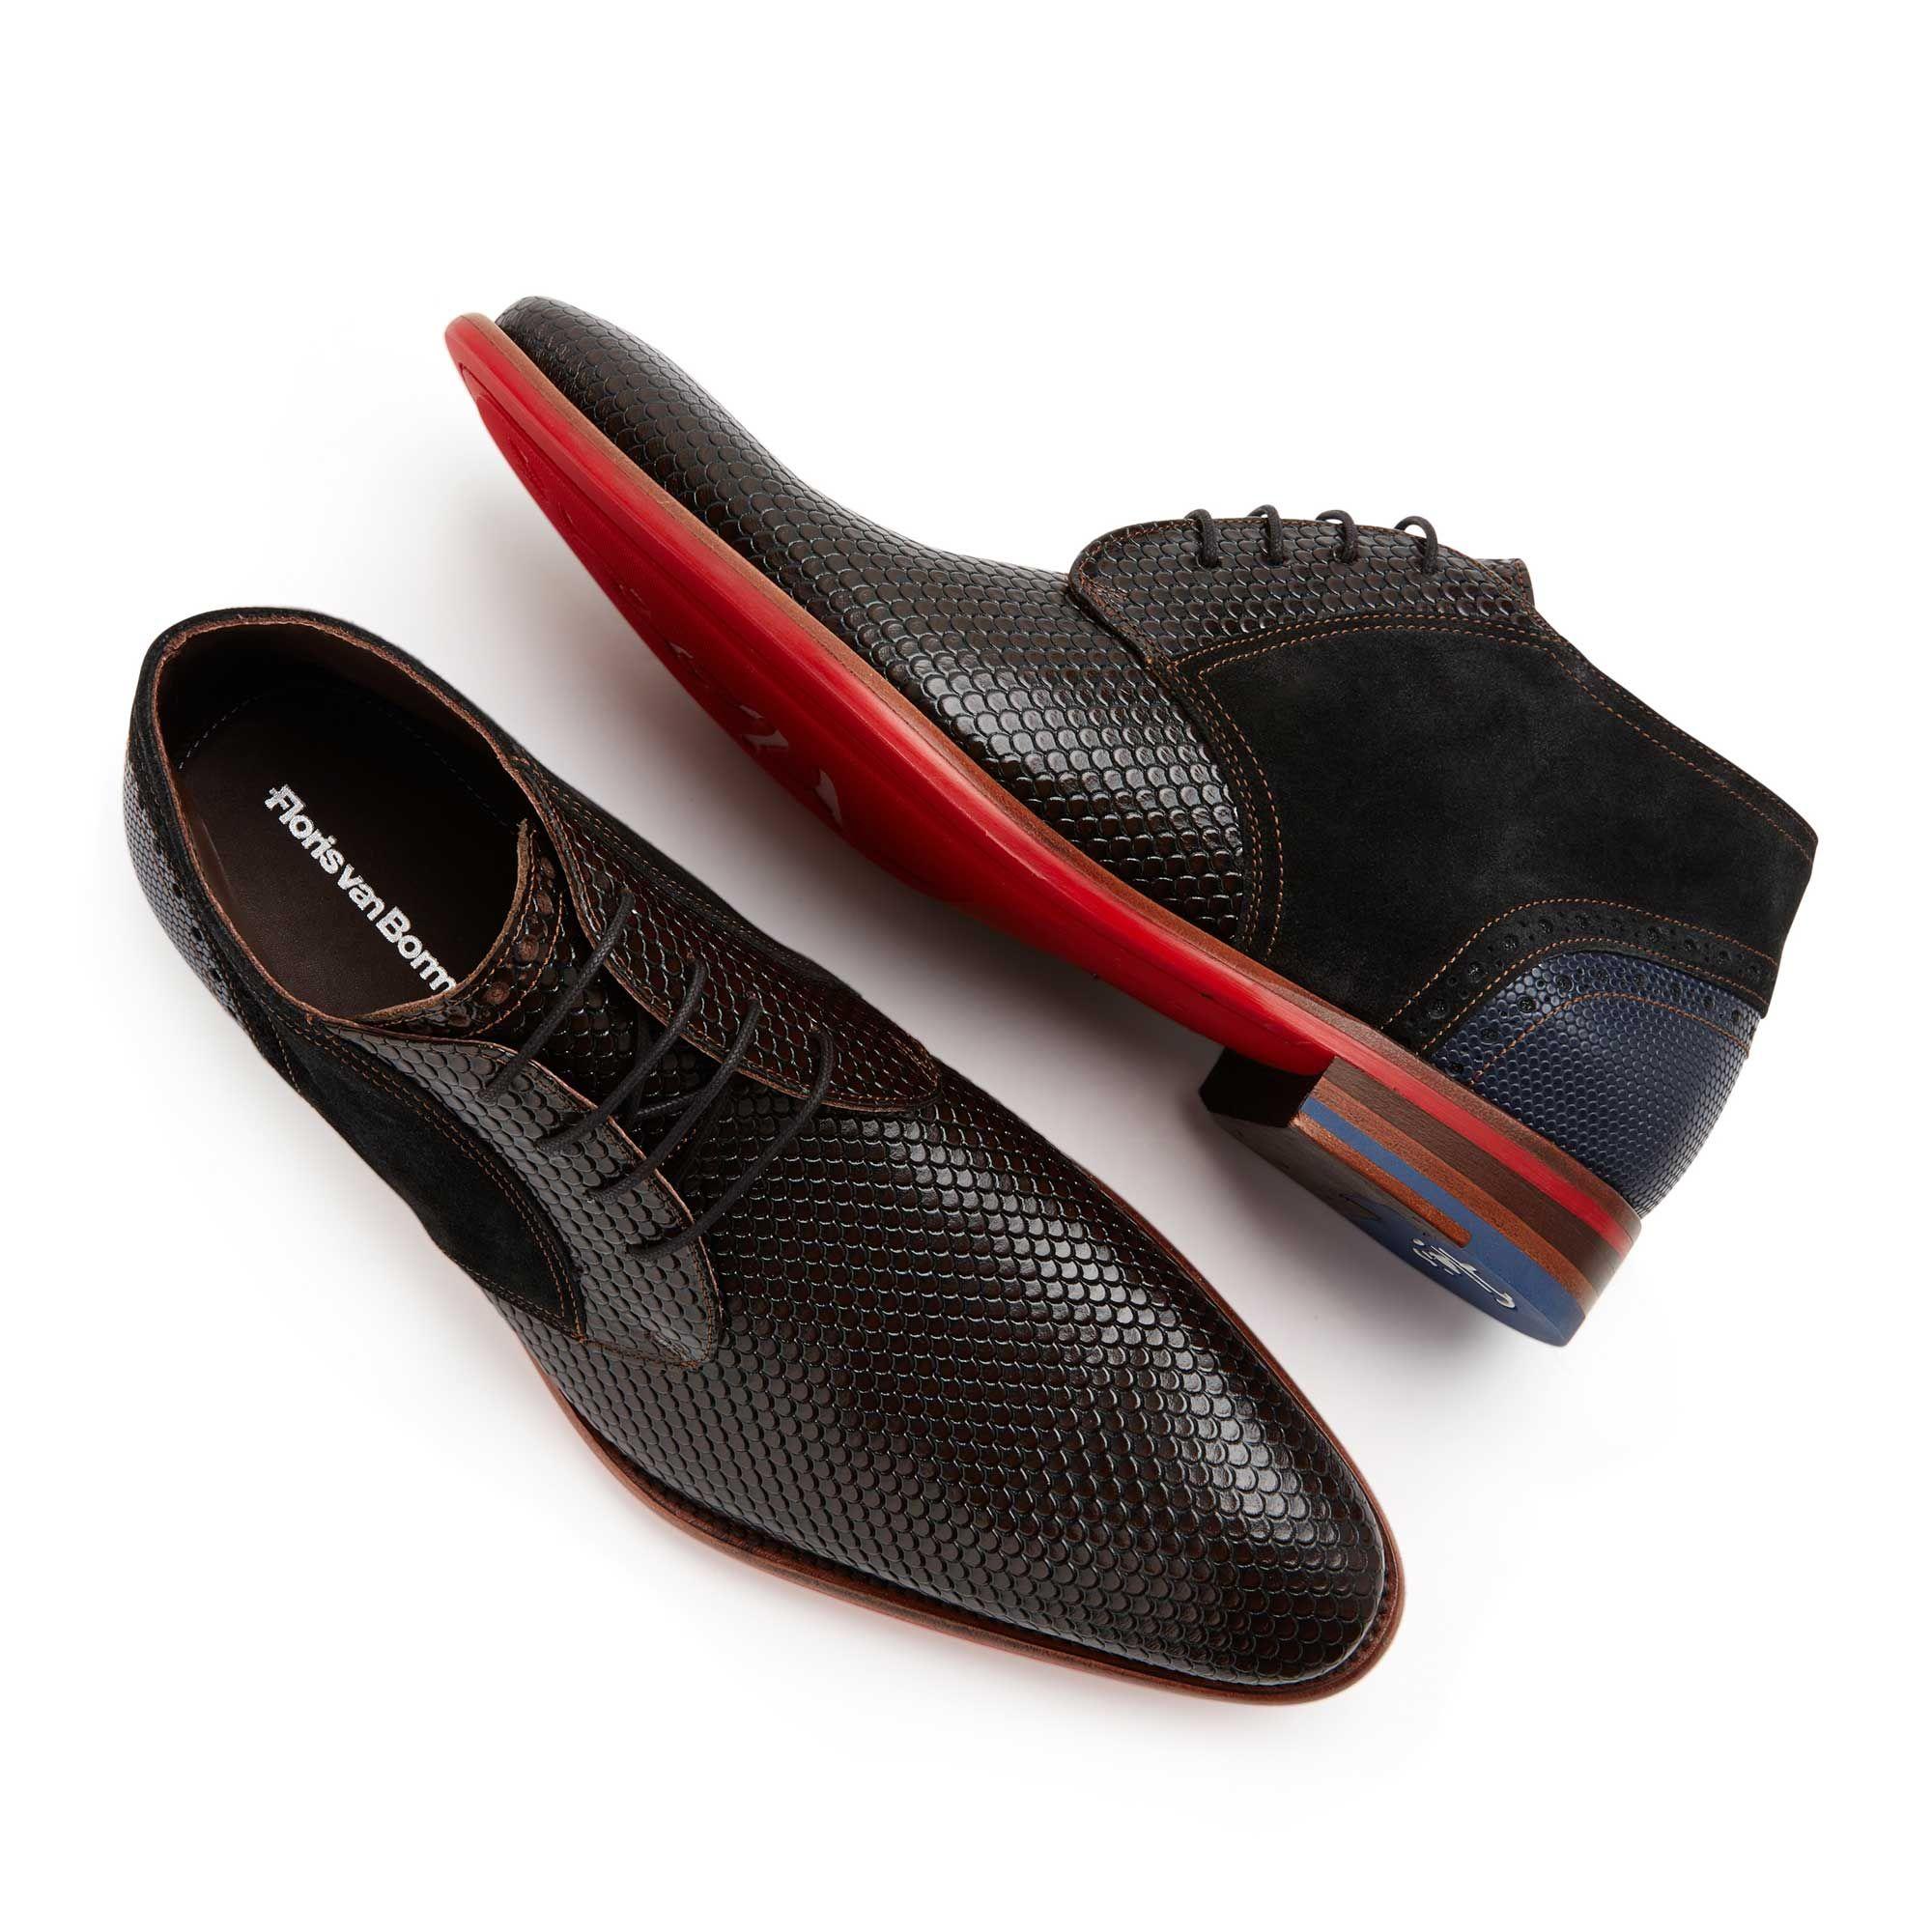 e0fa351129 10845 05 - Floris van Bommel leather men s lace boot dark brown ...